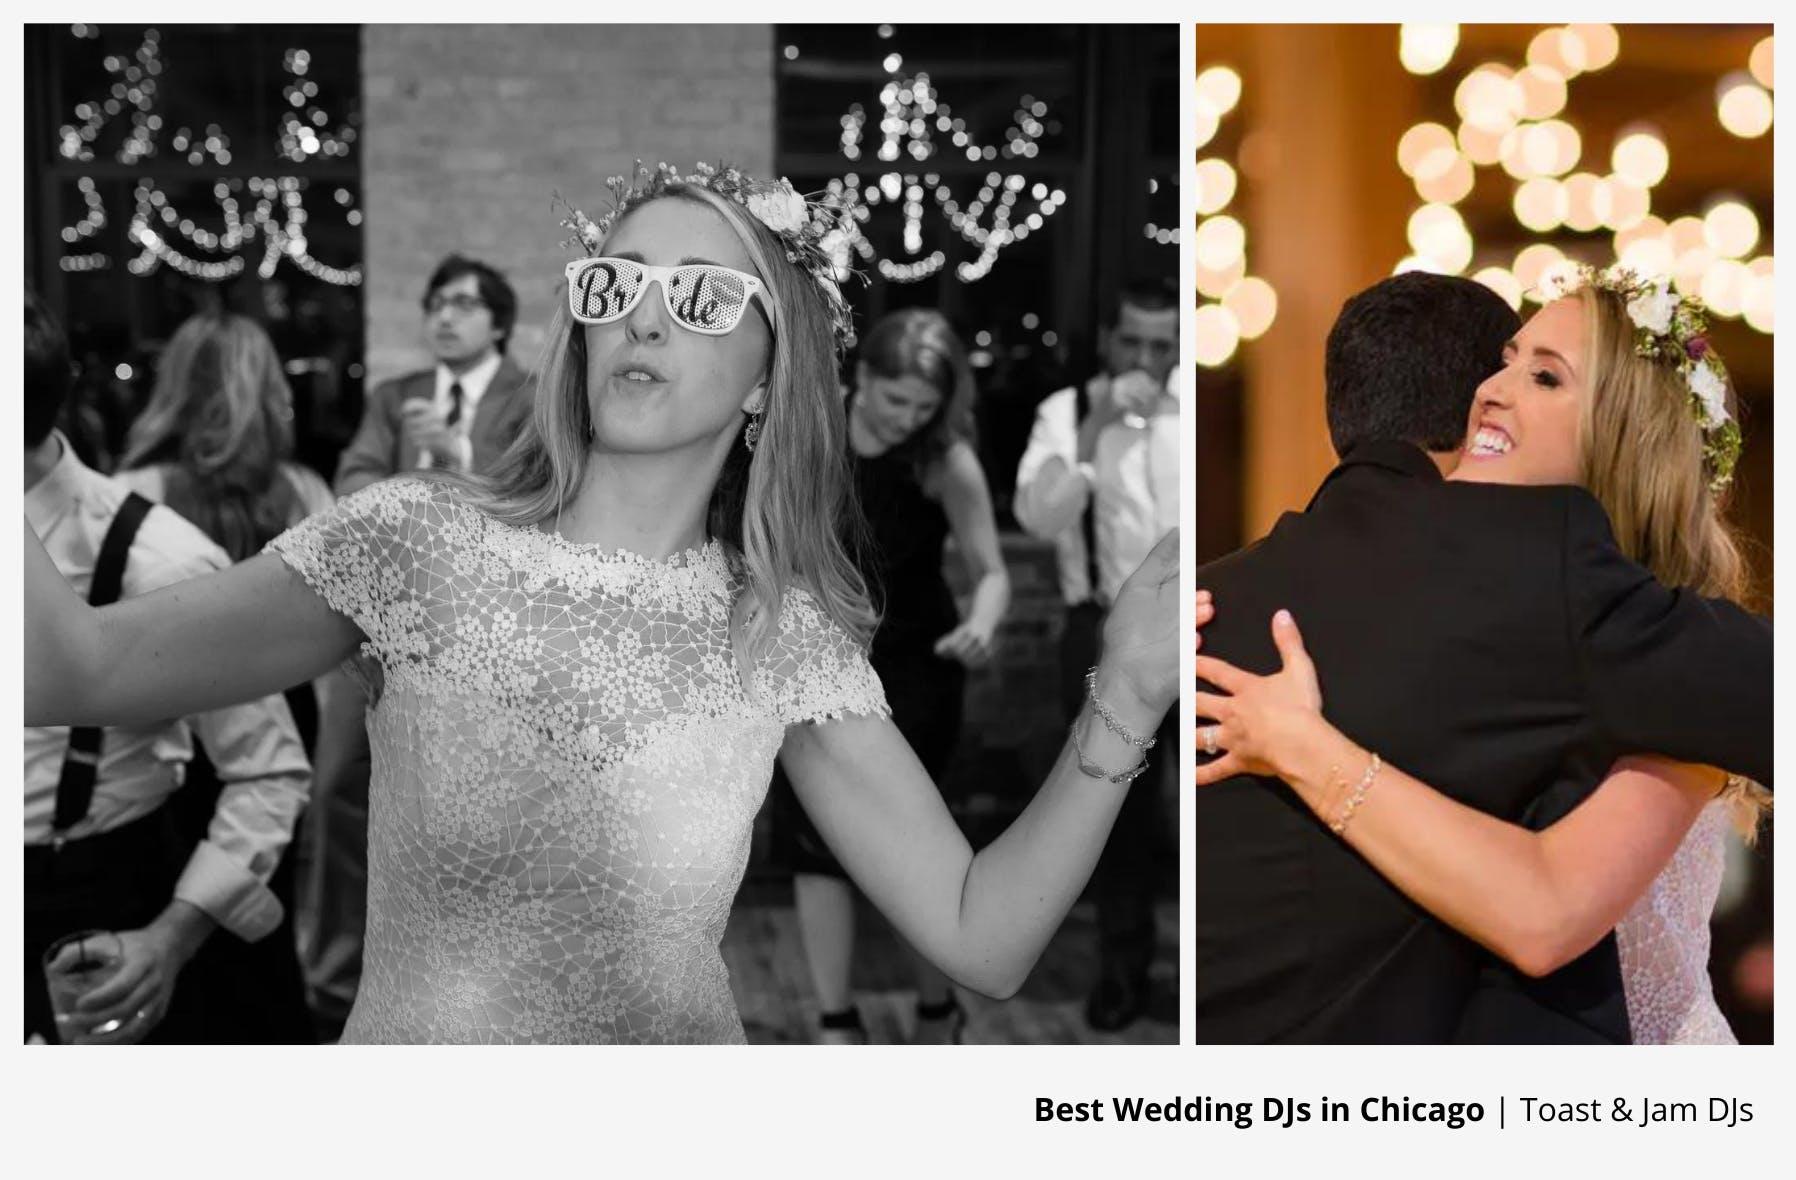 bride in white wearing novelty glasses dancing and bride hugging her husband on dance floor to wedding dj | PartySlate